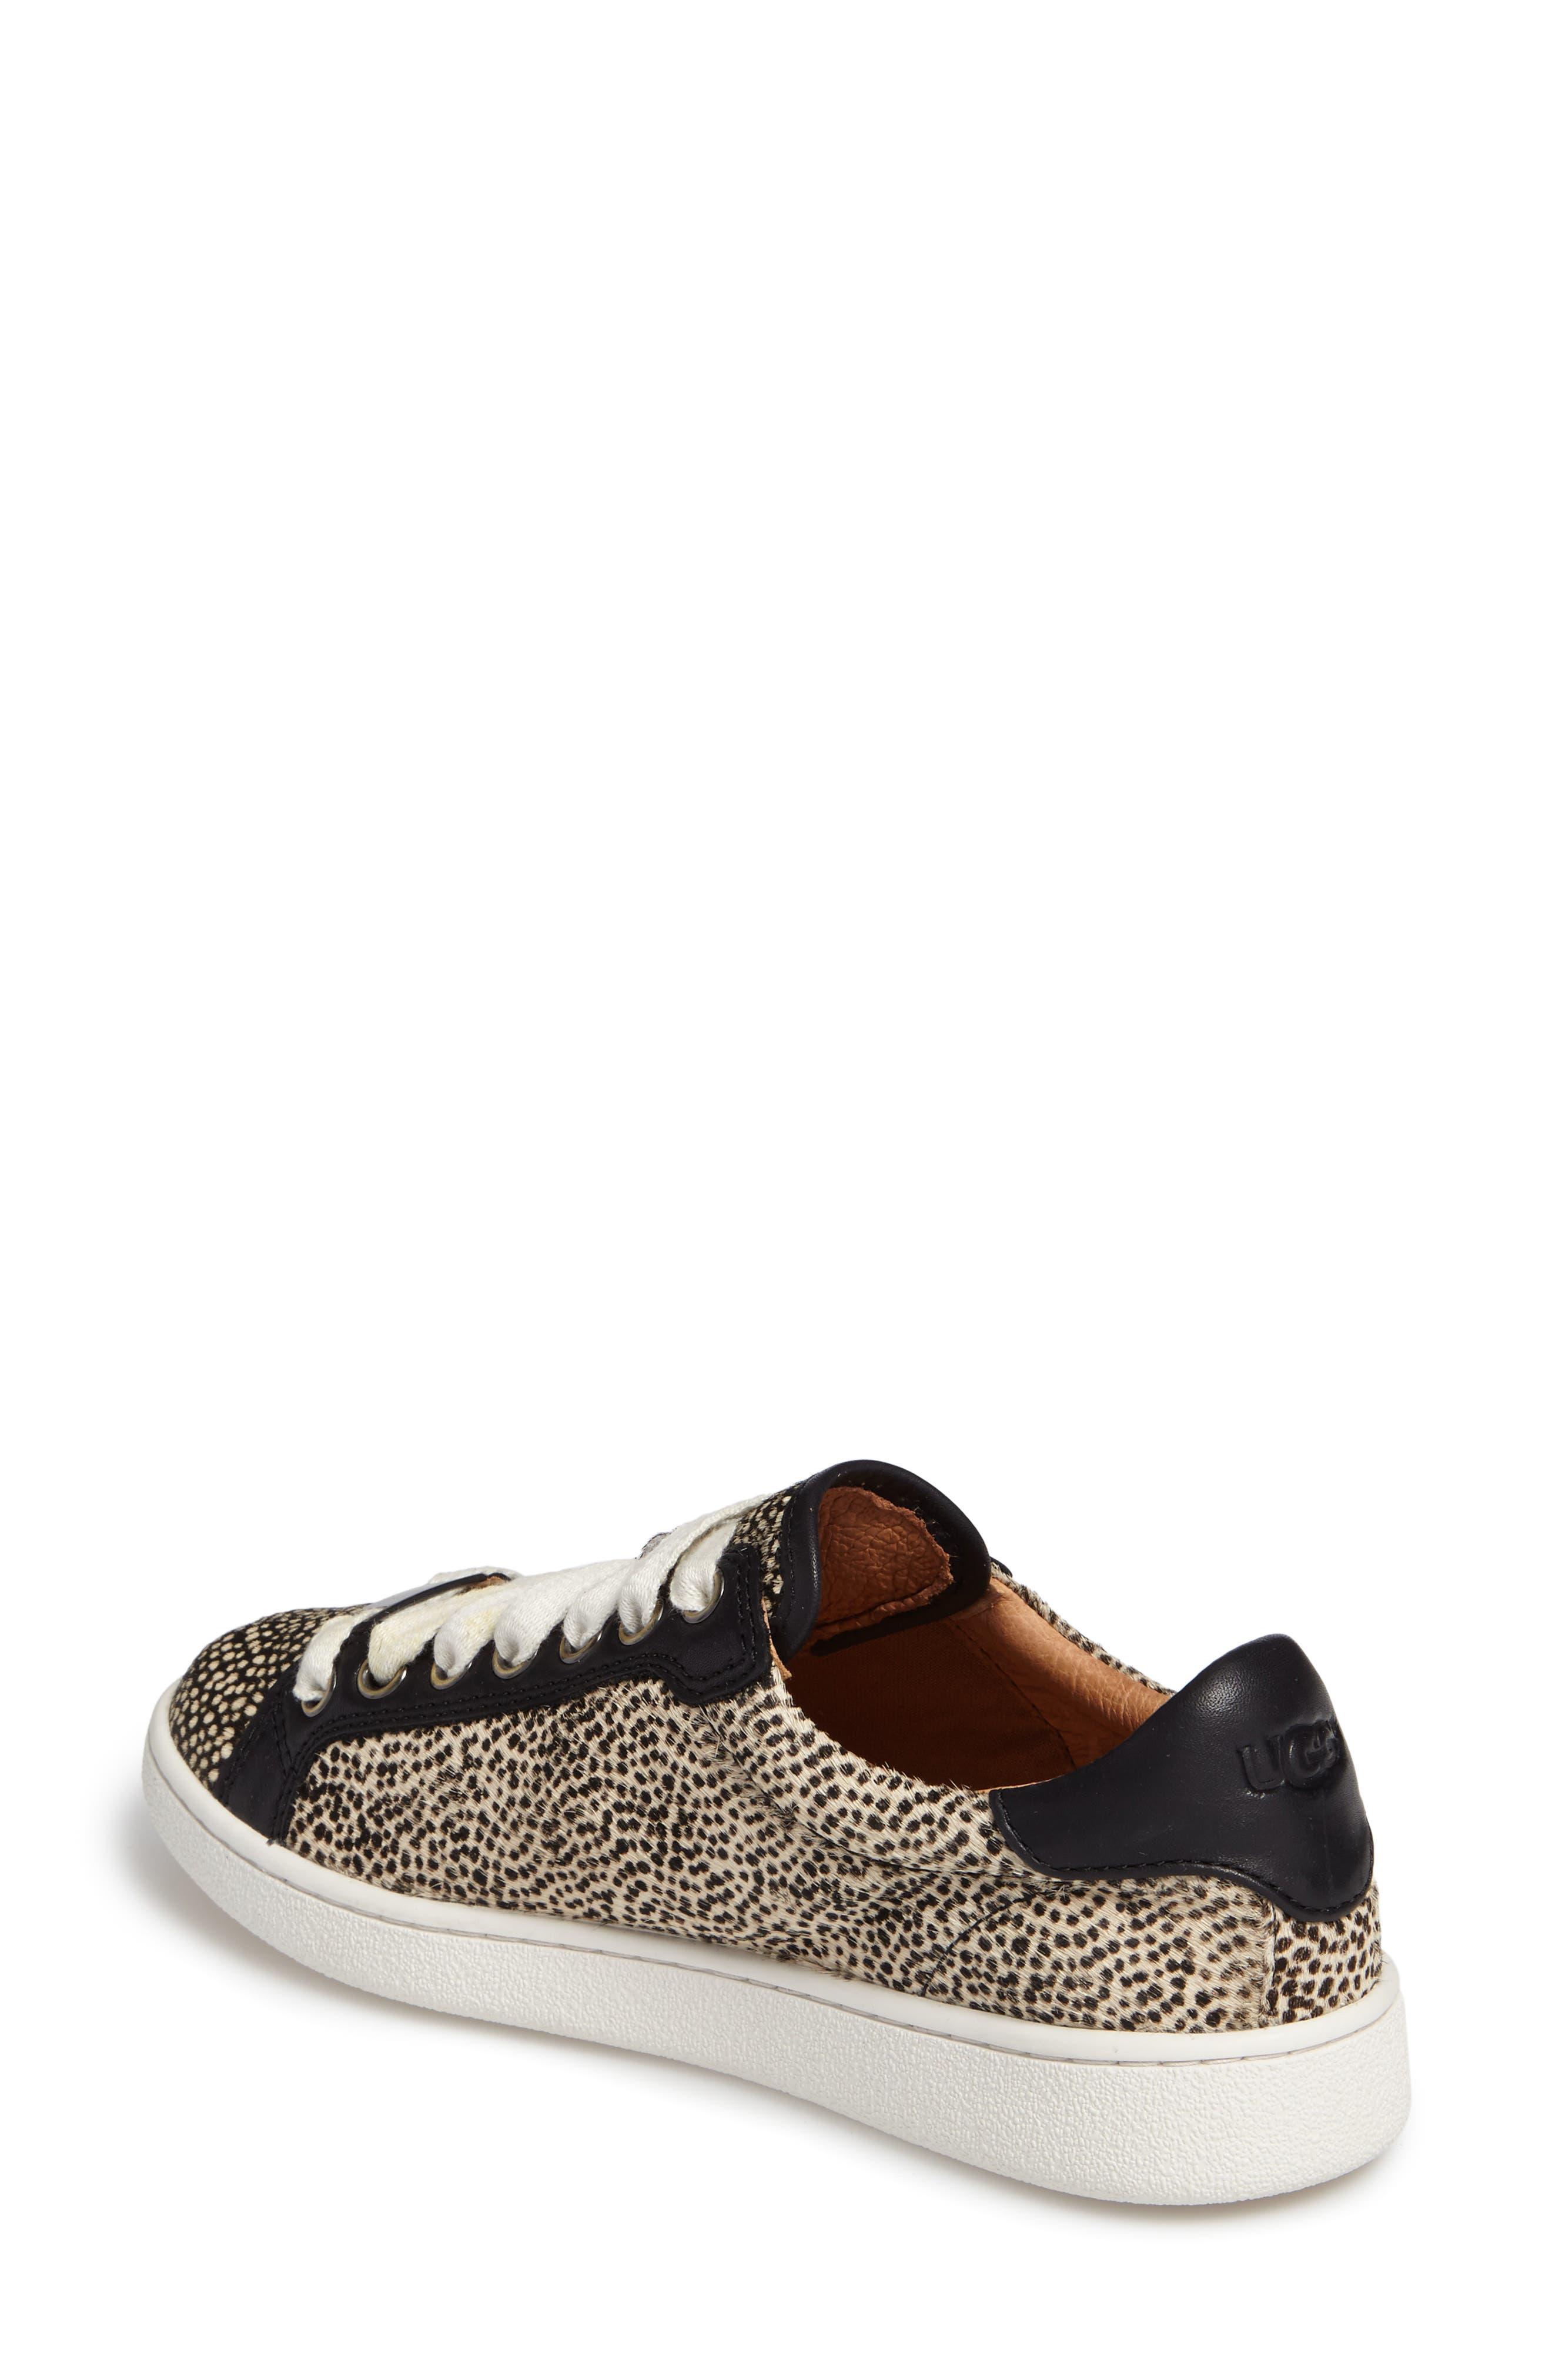 Alternate Image 2  - UGG® Milo Genuine Calf Hair Sneaker (Women)